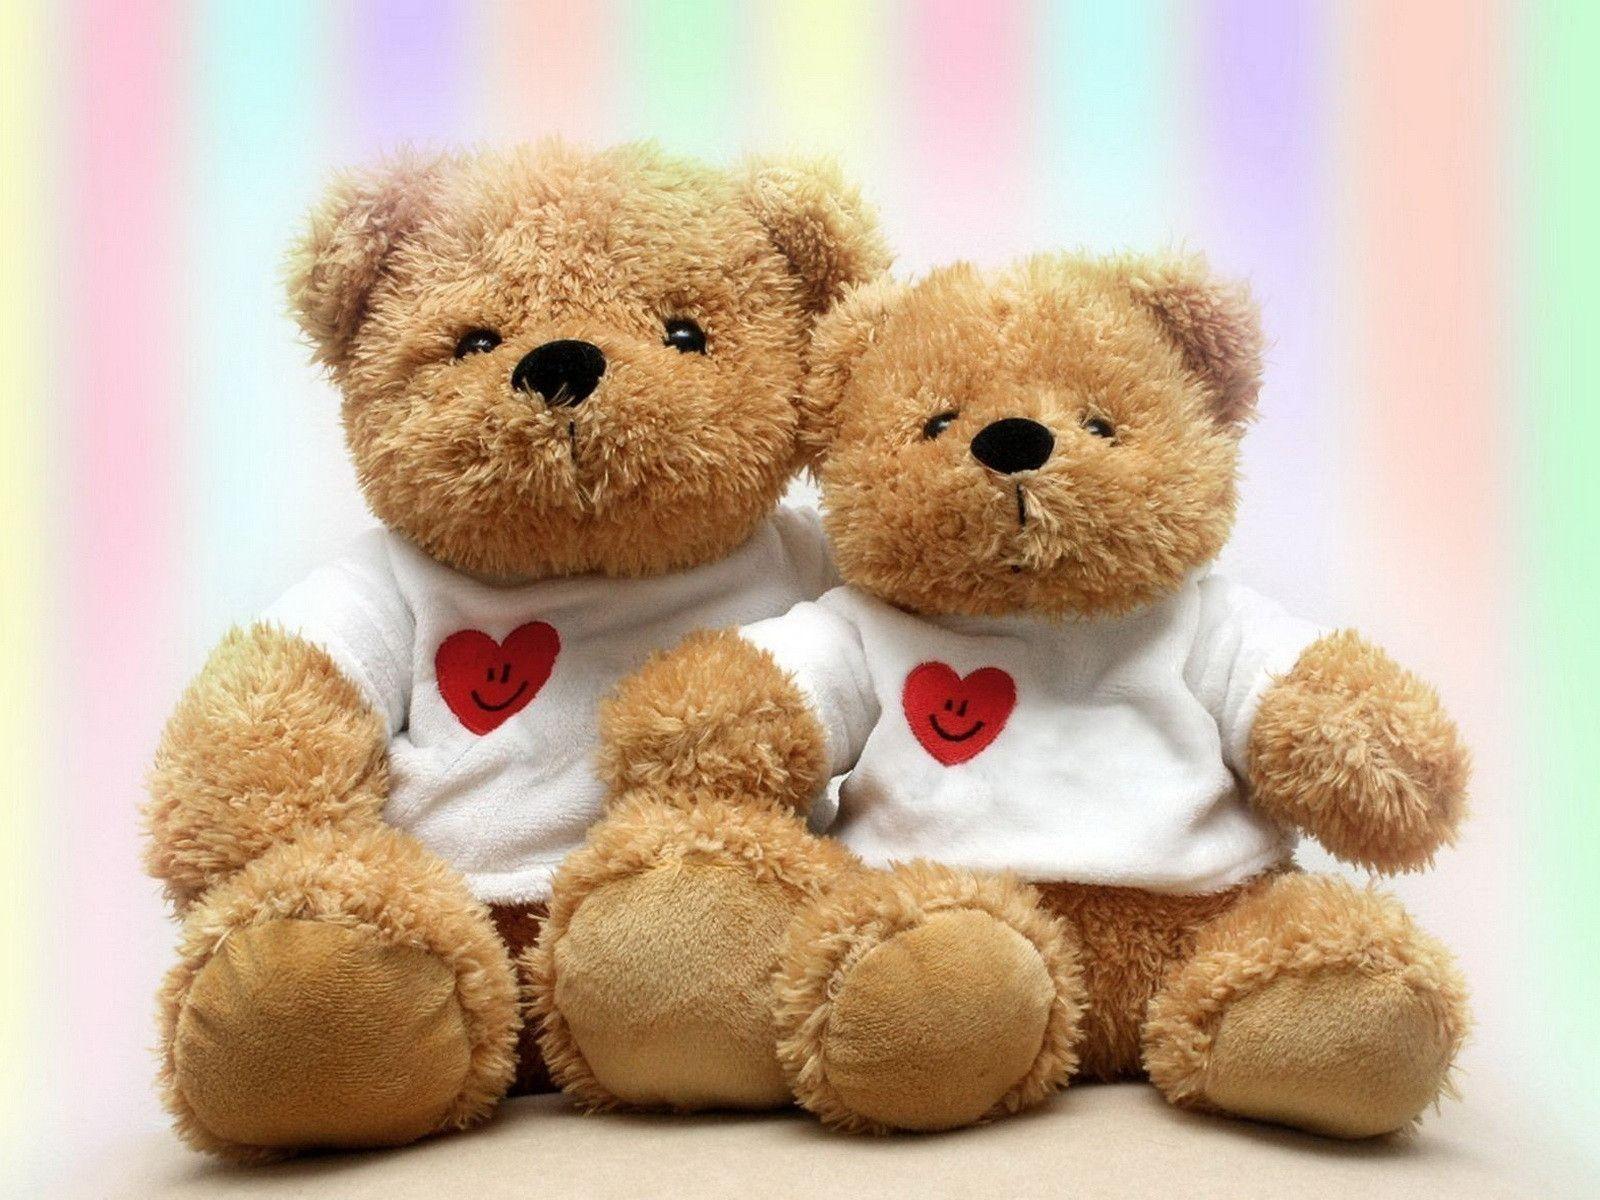 Best Wallpaper Love Teddy Bear - 0d9ee5dd74178ad51b13740bd26689f7  Collection_40774.jpg